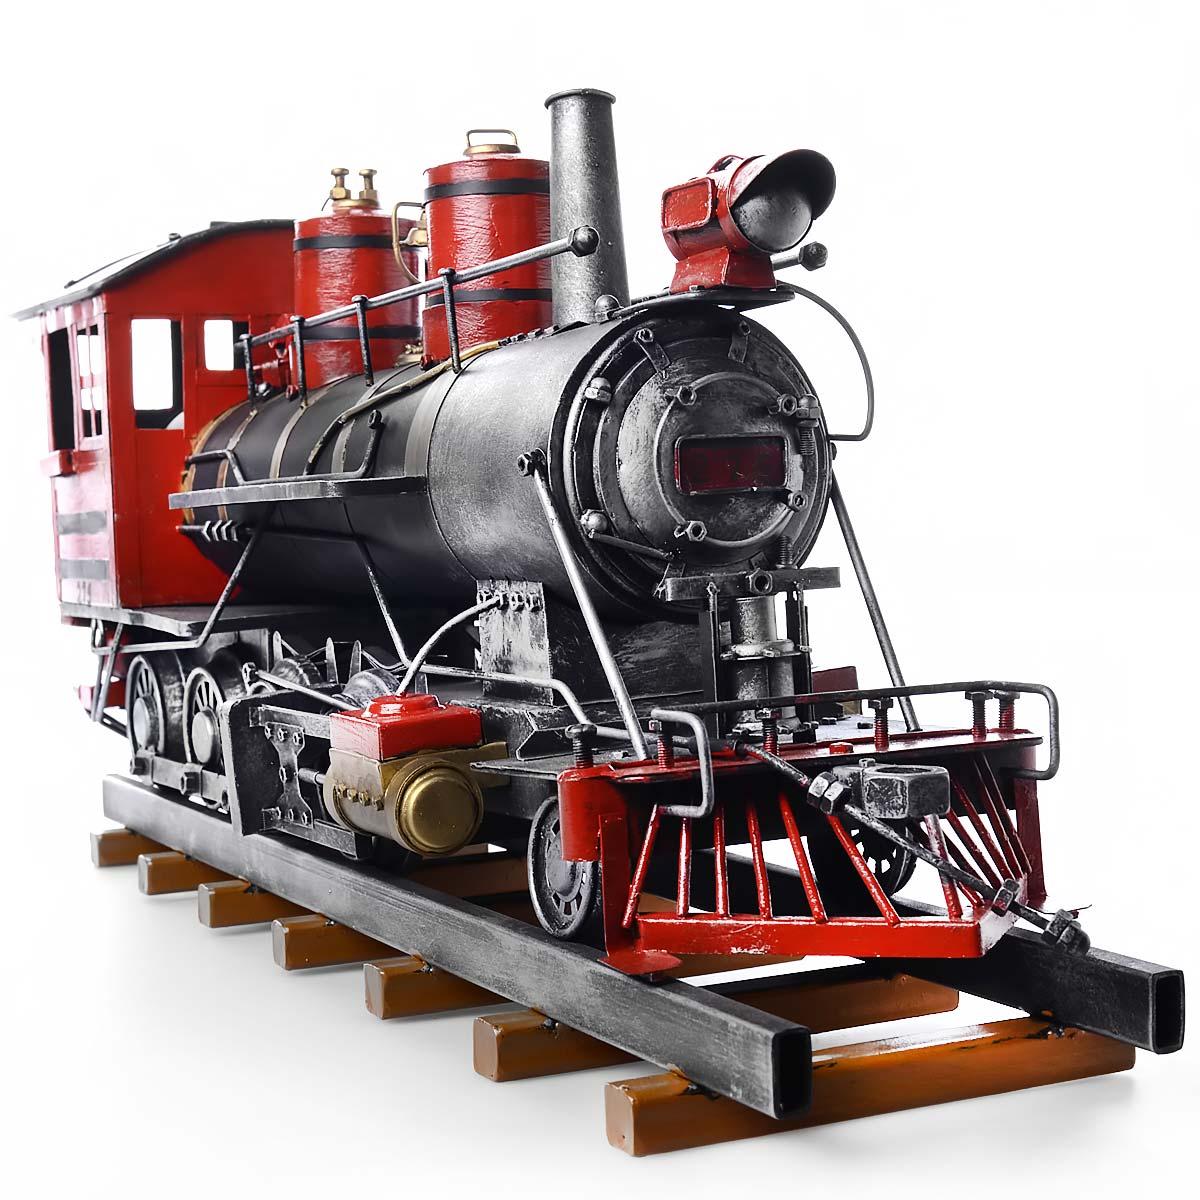 Vintage χειροποίητο διακοσμητικό τρένο με βαγόνι μεταλλικό - OEM 51614